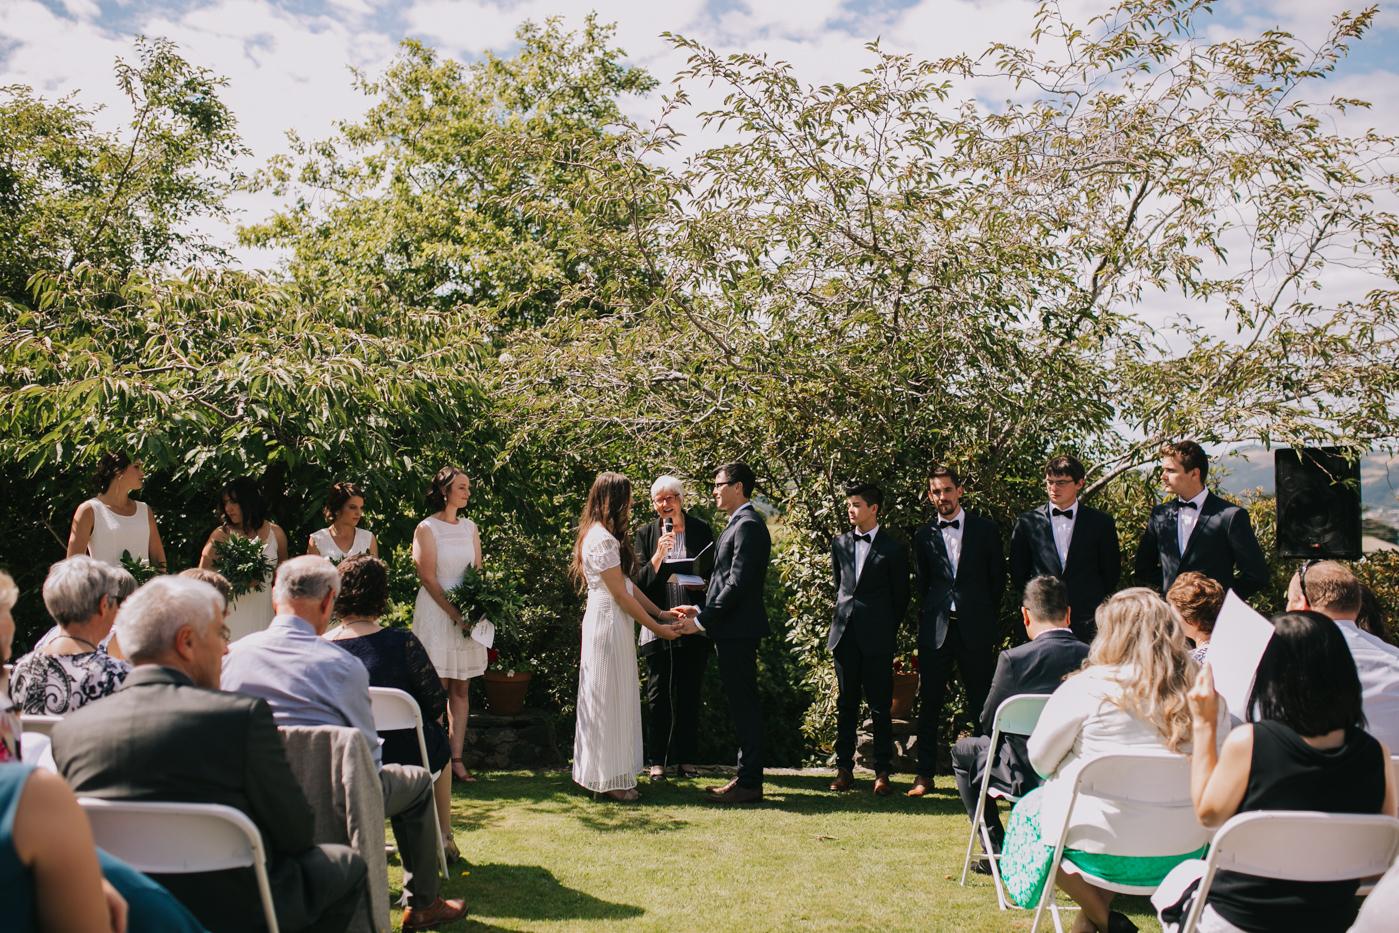 Ariana & Tim - Dunedin, New Zealand Wedding - Destination Wedding - Samantha Heather Photography-96.jpg